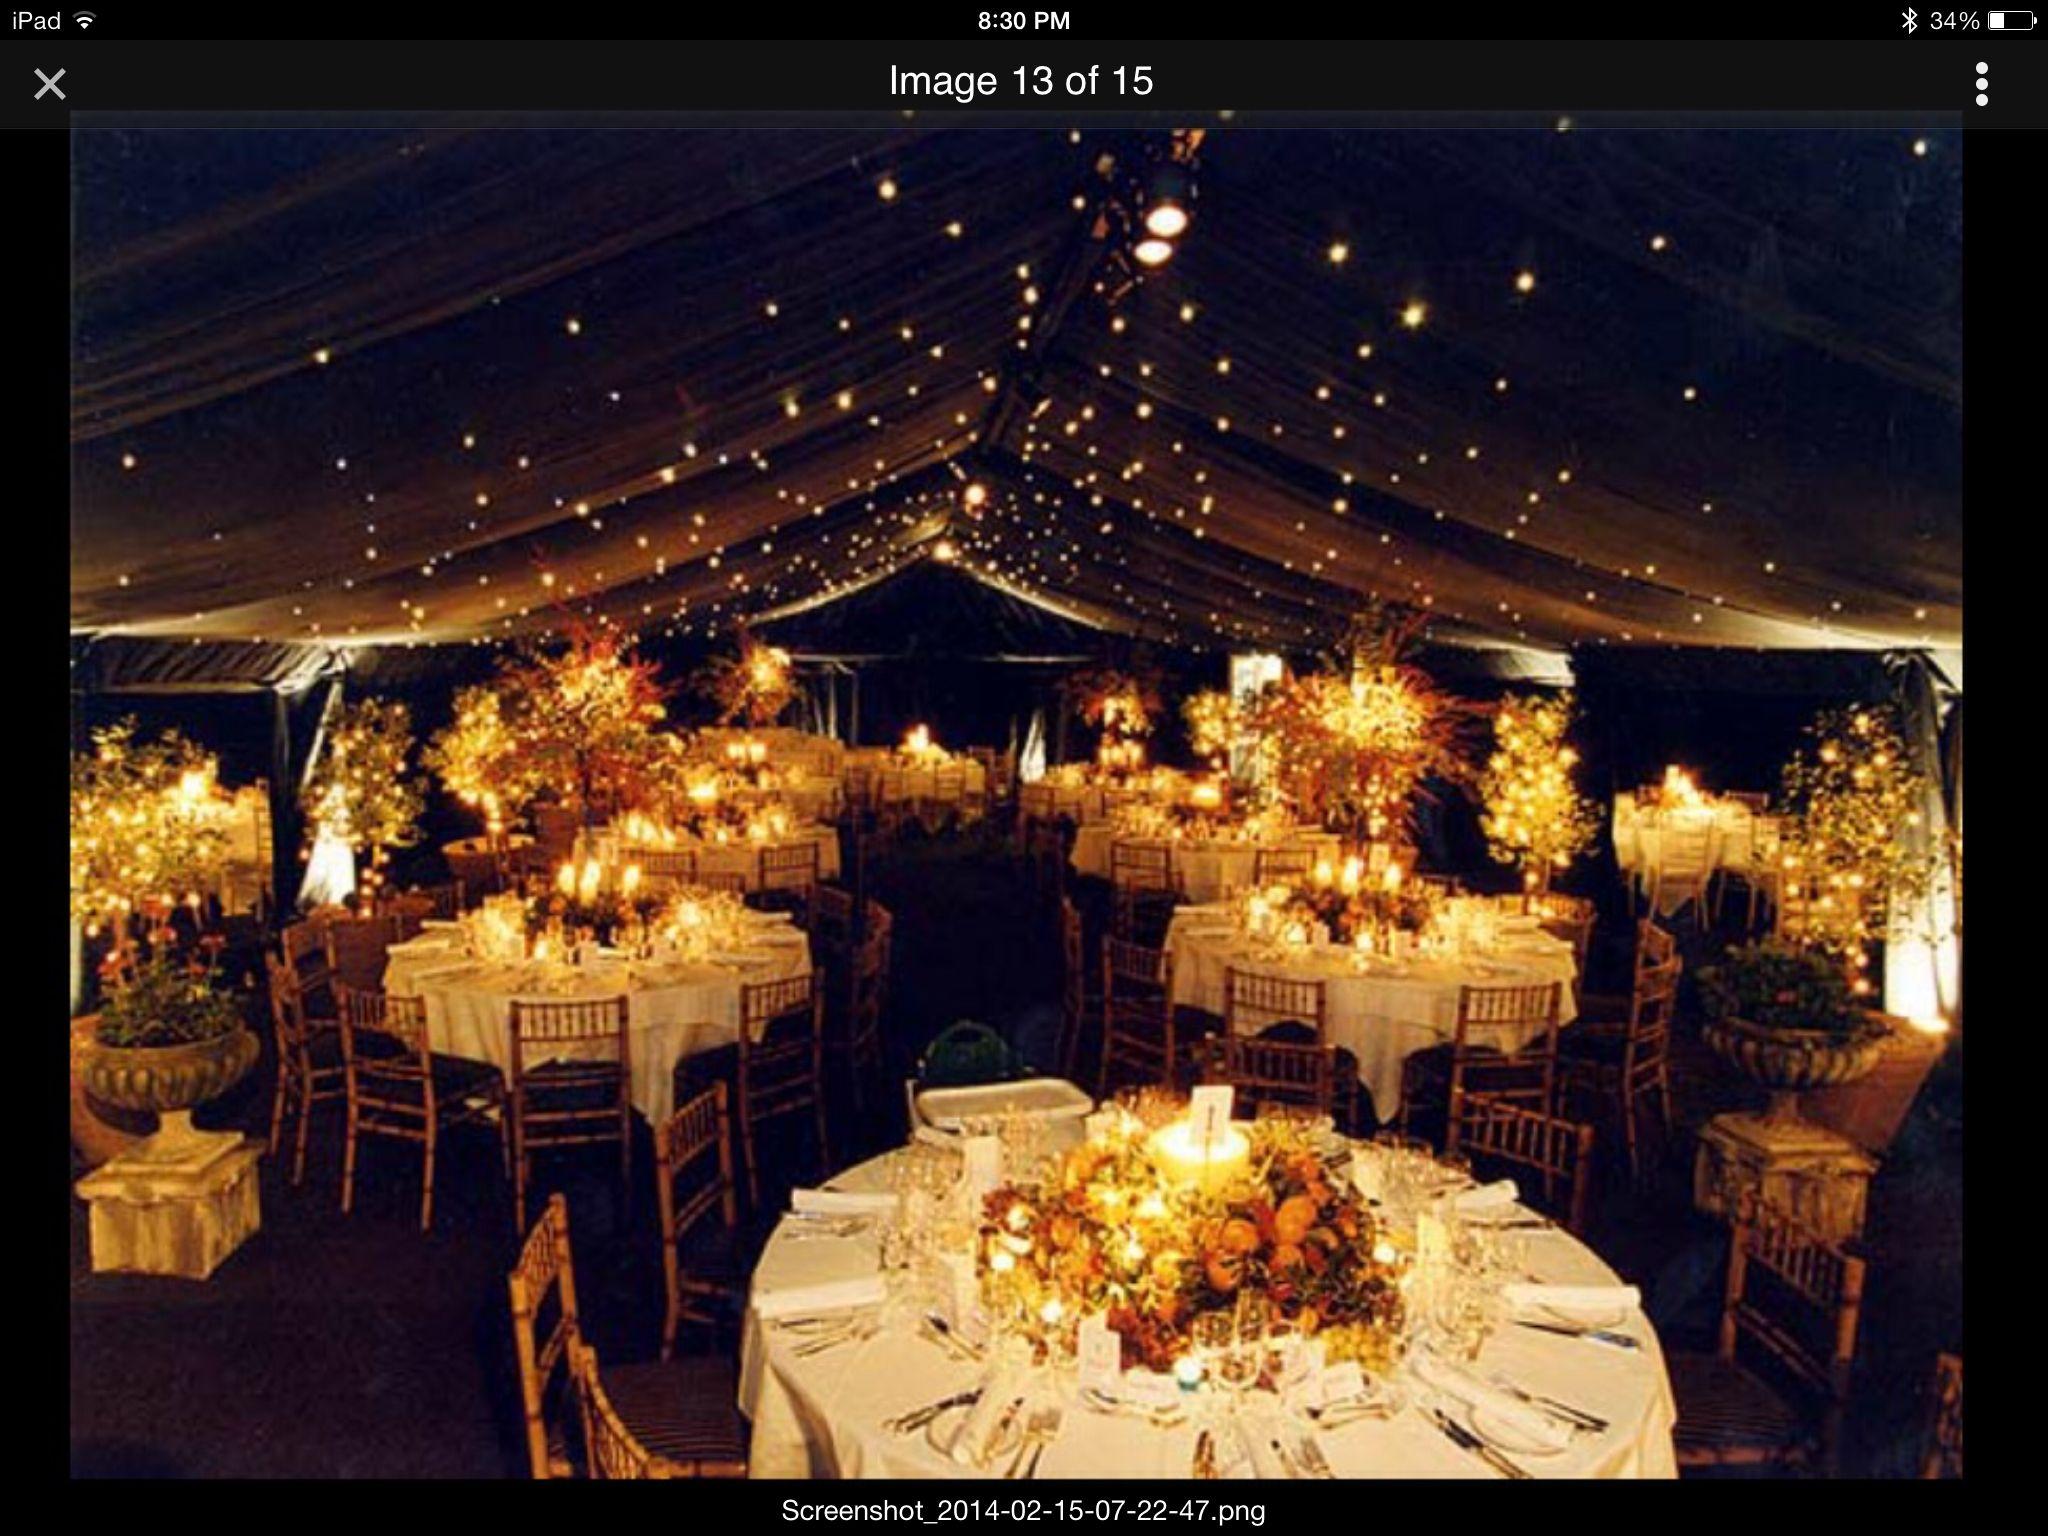 Outdoor wedding at night   Wedding themes